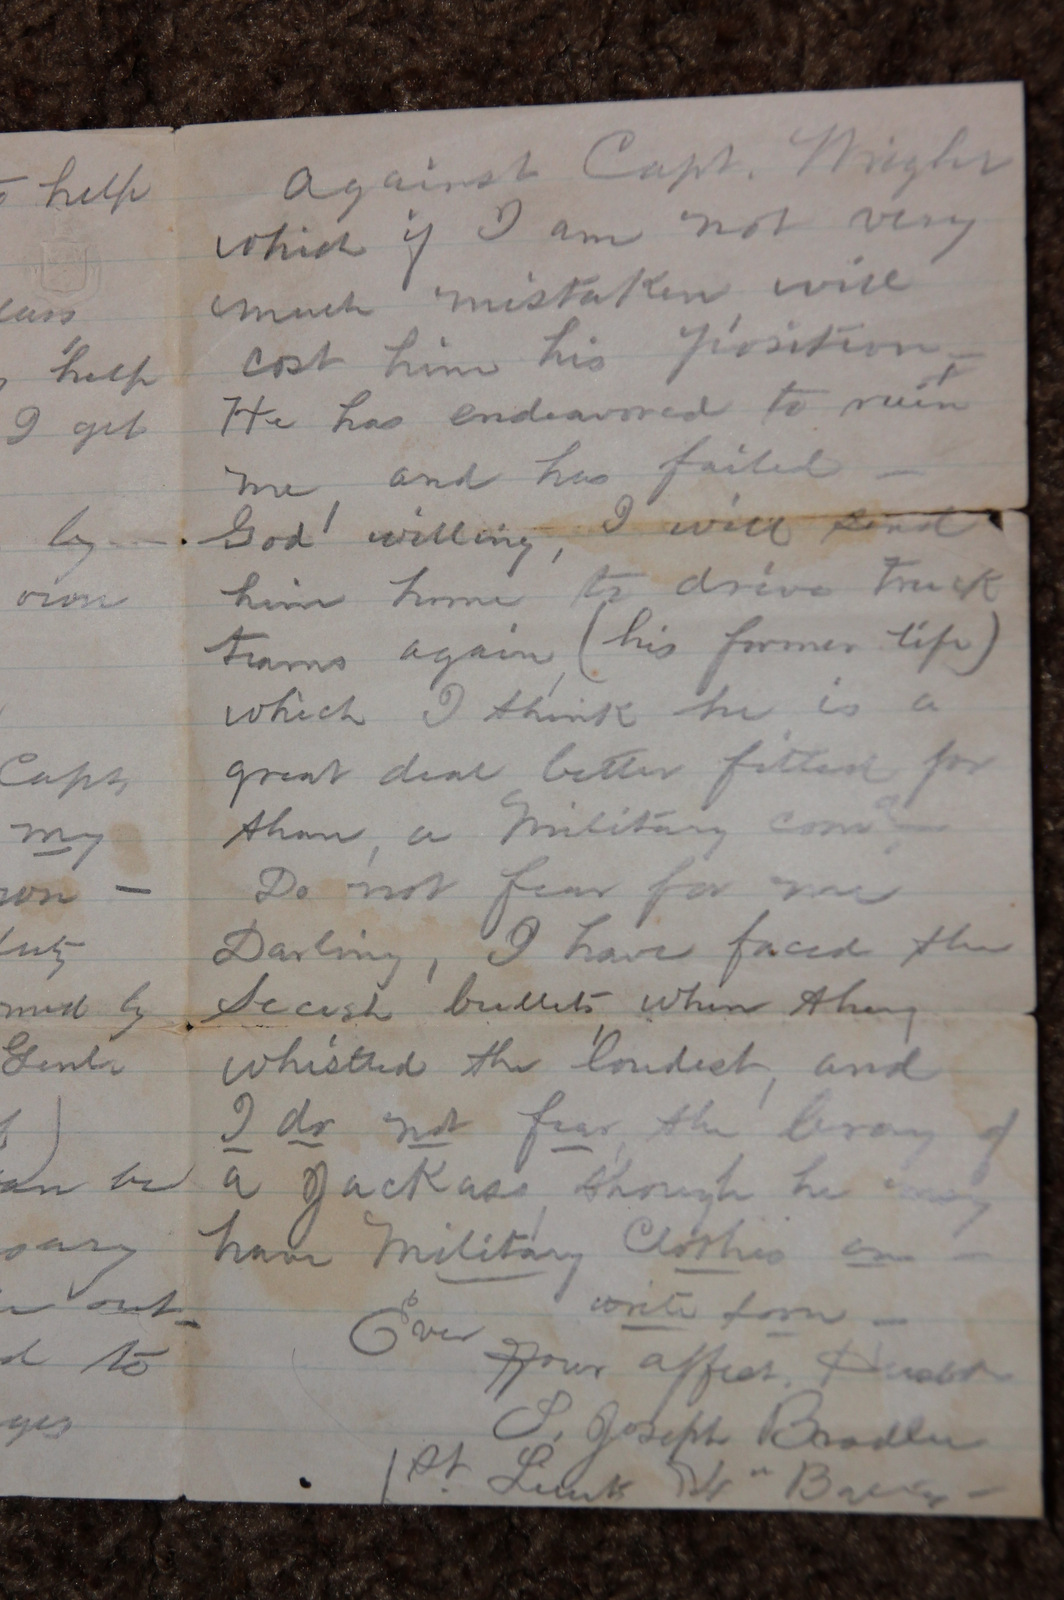 18640627 Samuel J Bradlee Letter 14th Btty MA Lt Arty Page 3